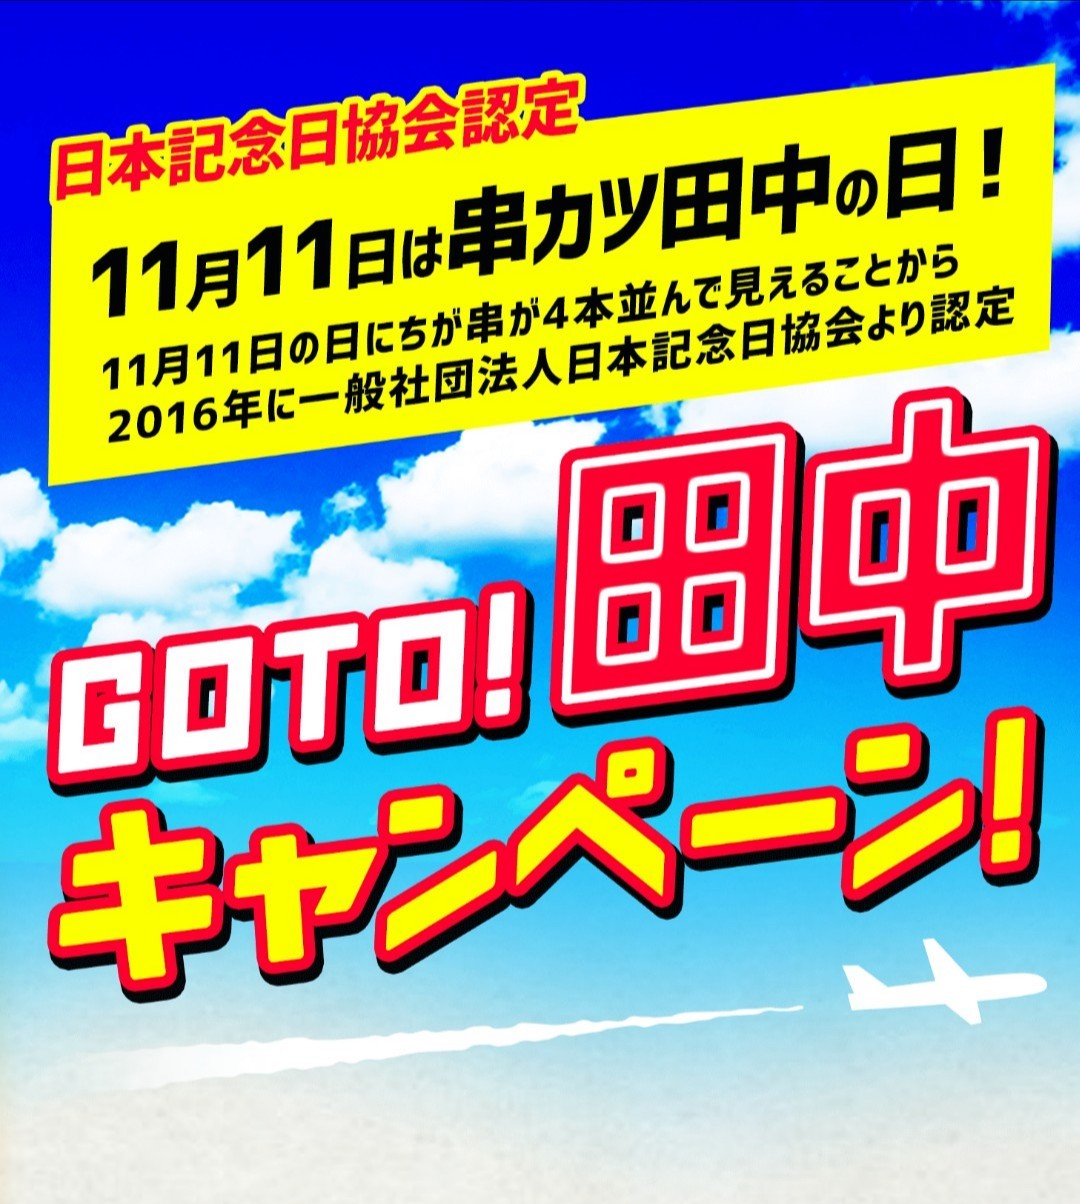 GOTO田中キャンペーン!広告